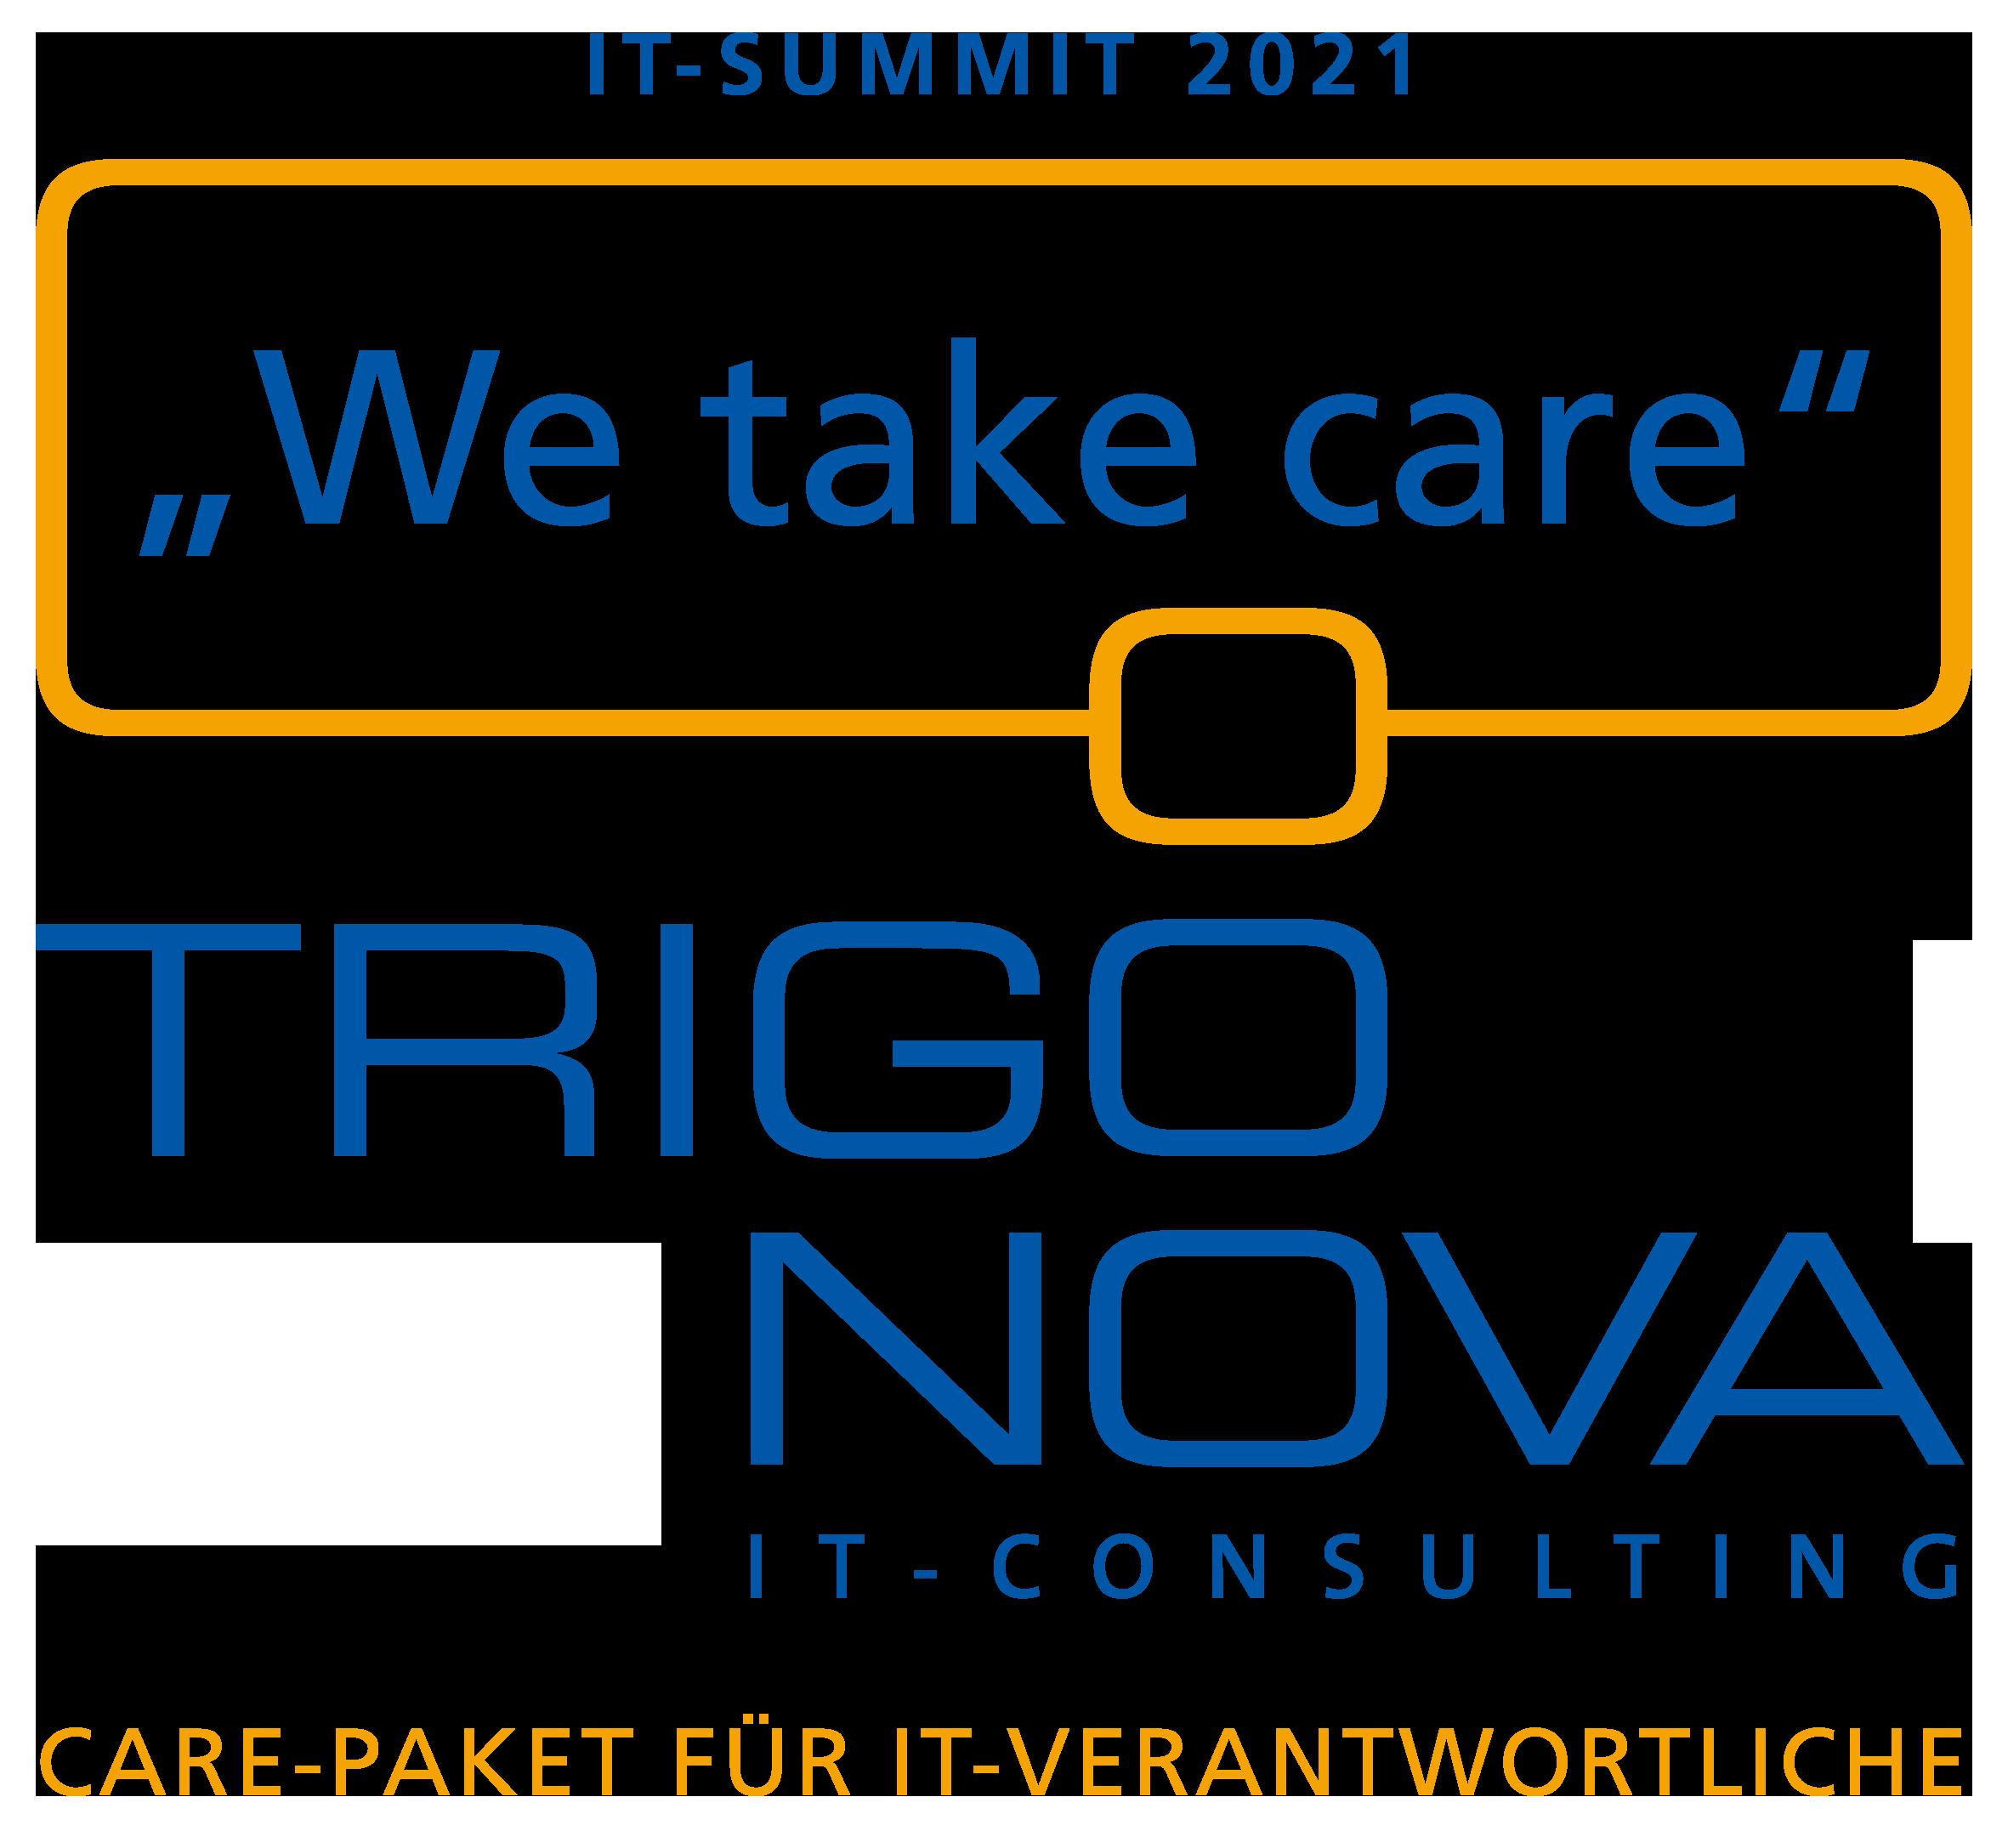 IT Summit 2021 - We take care